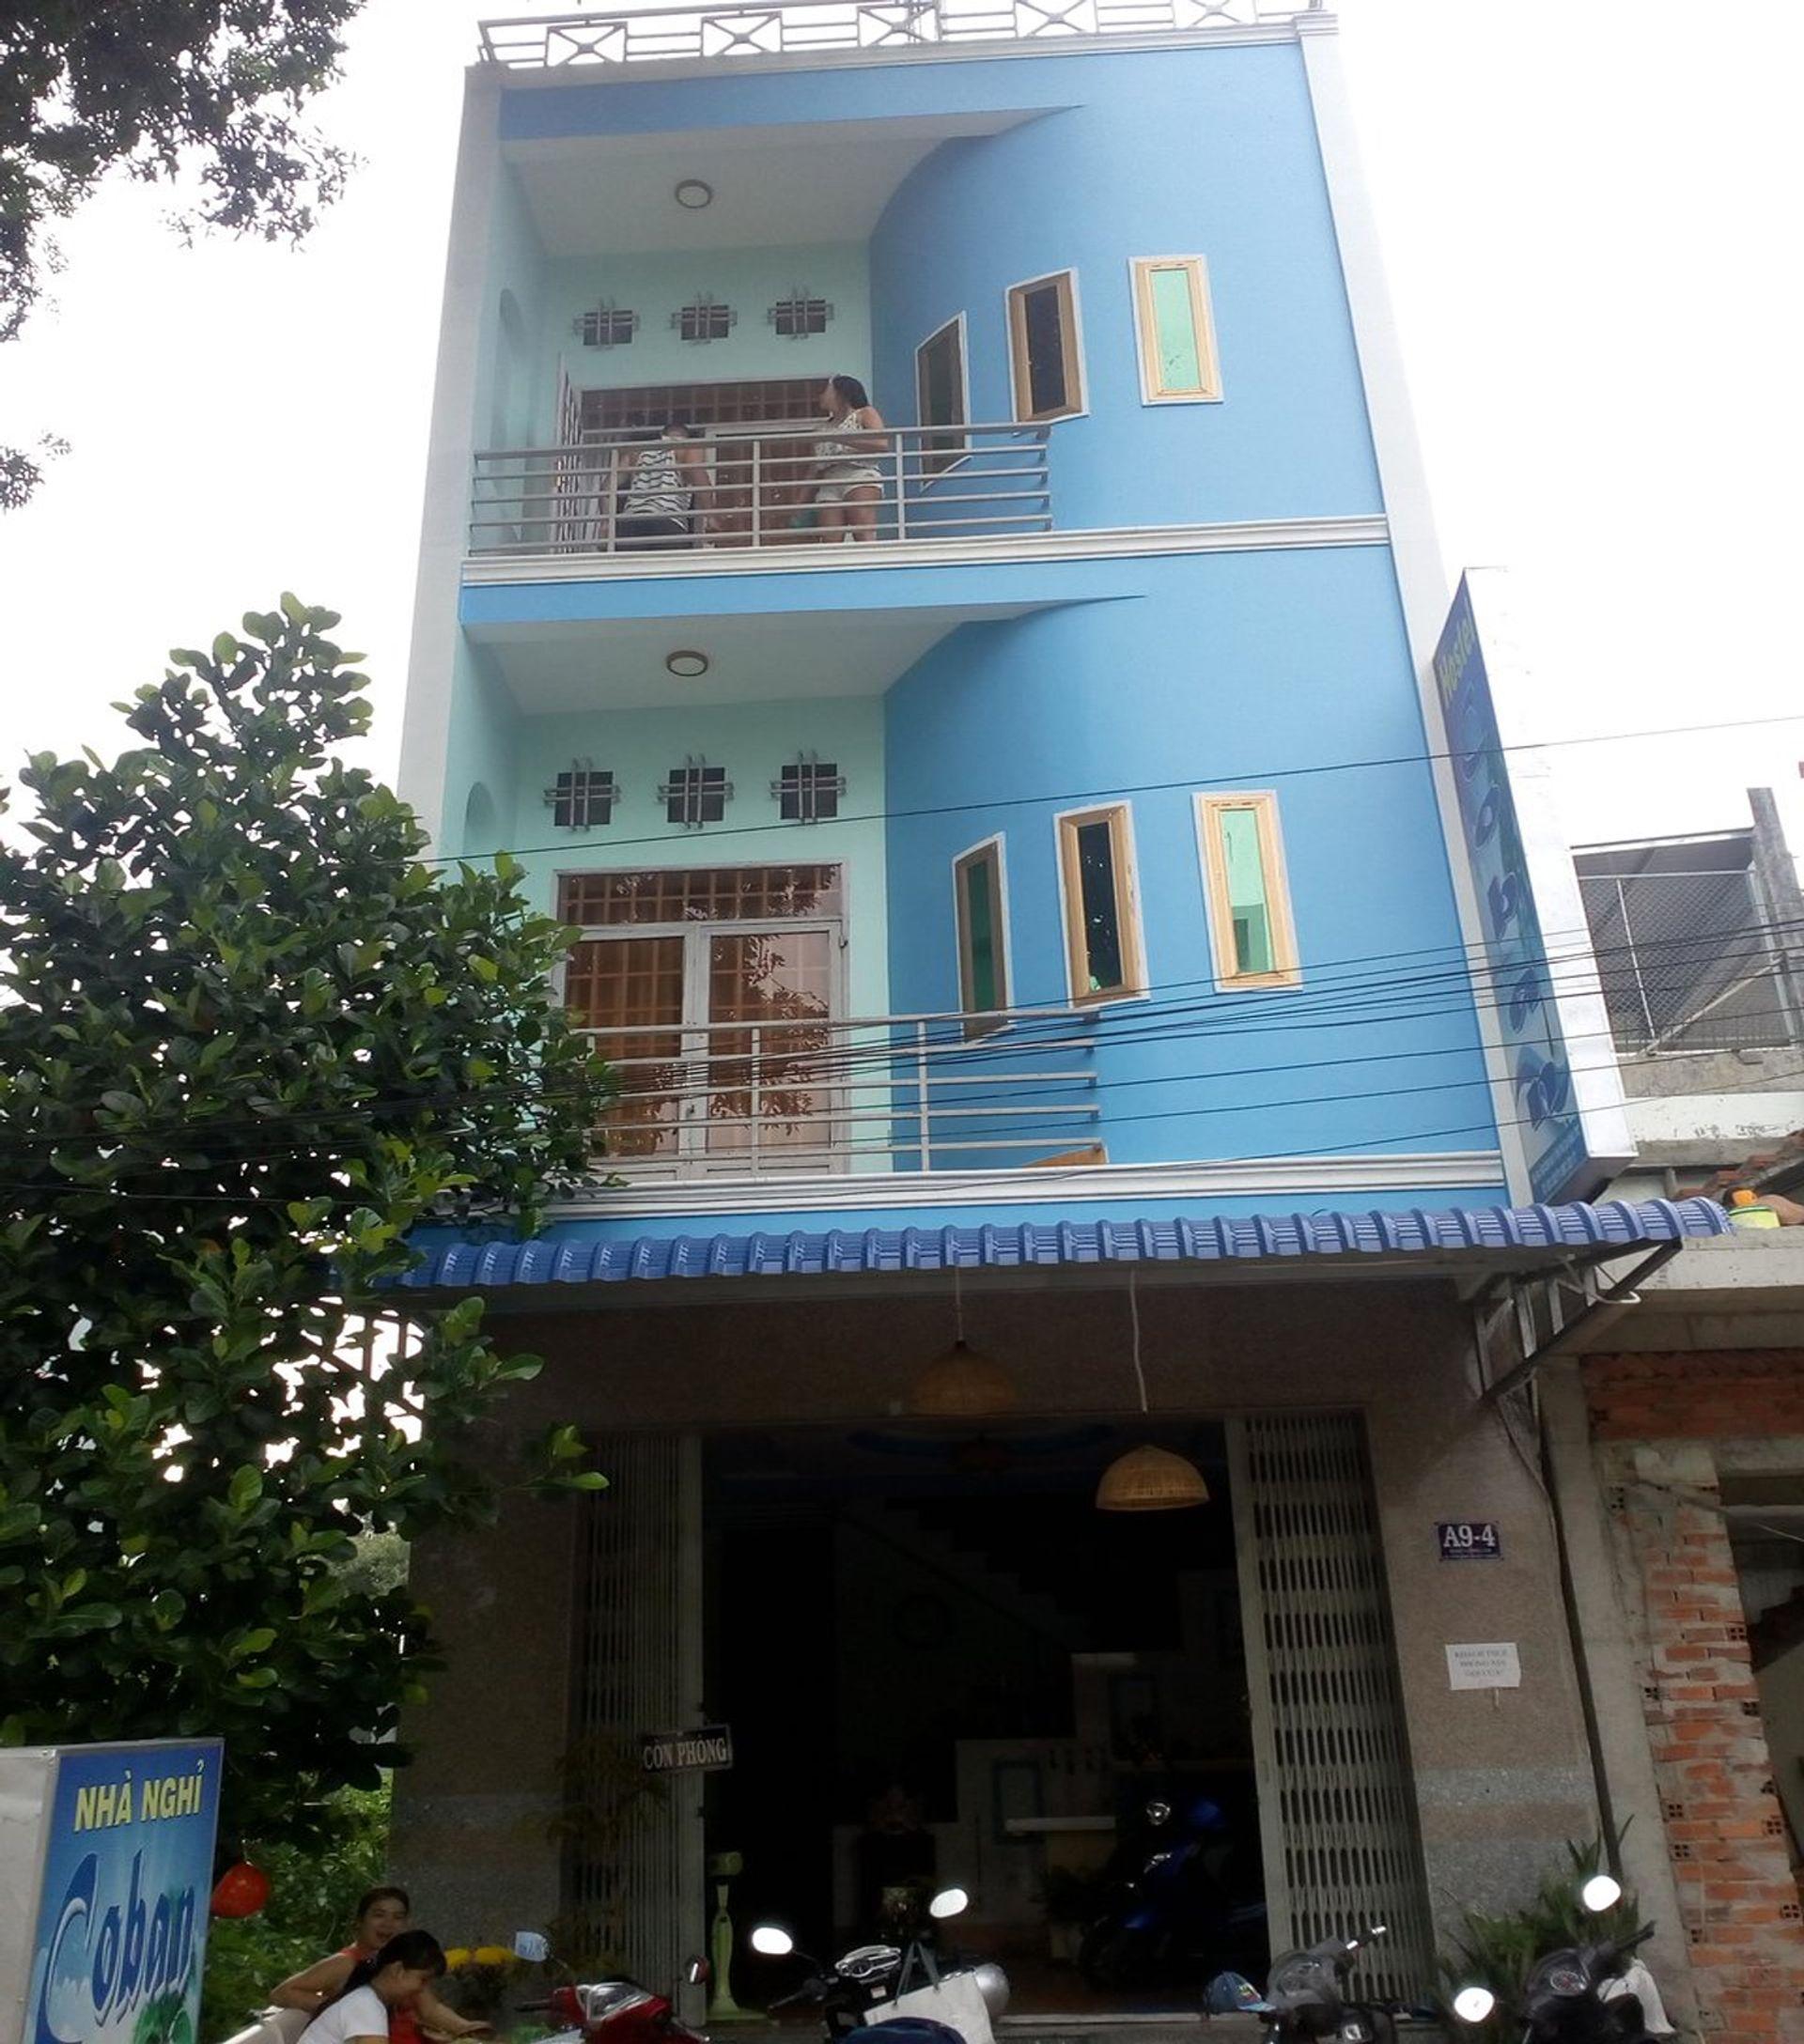 Coban Hostel